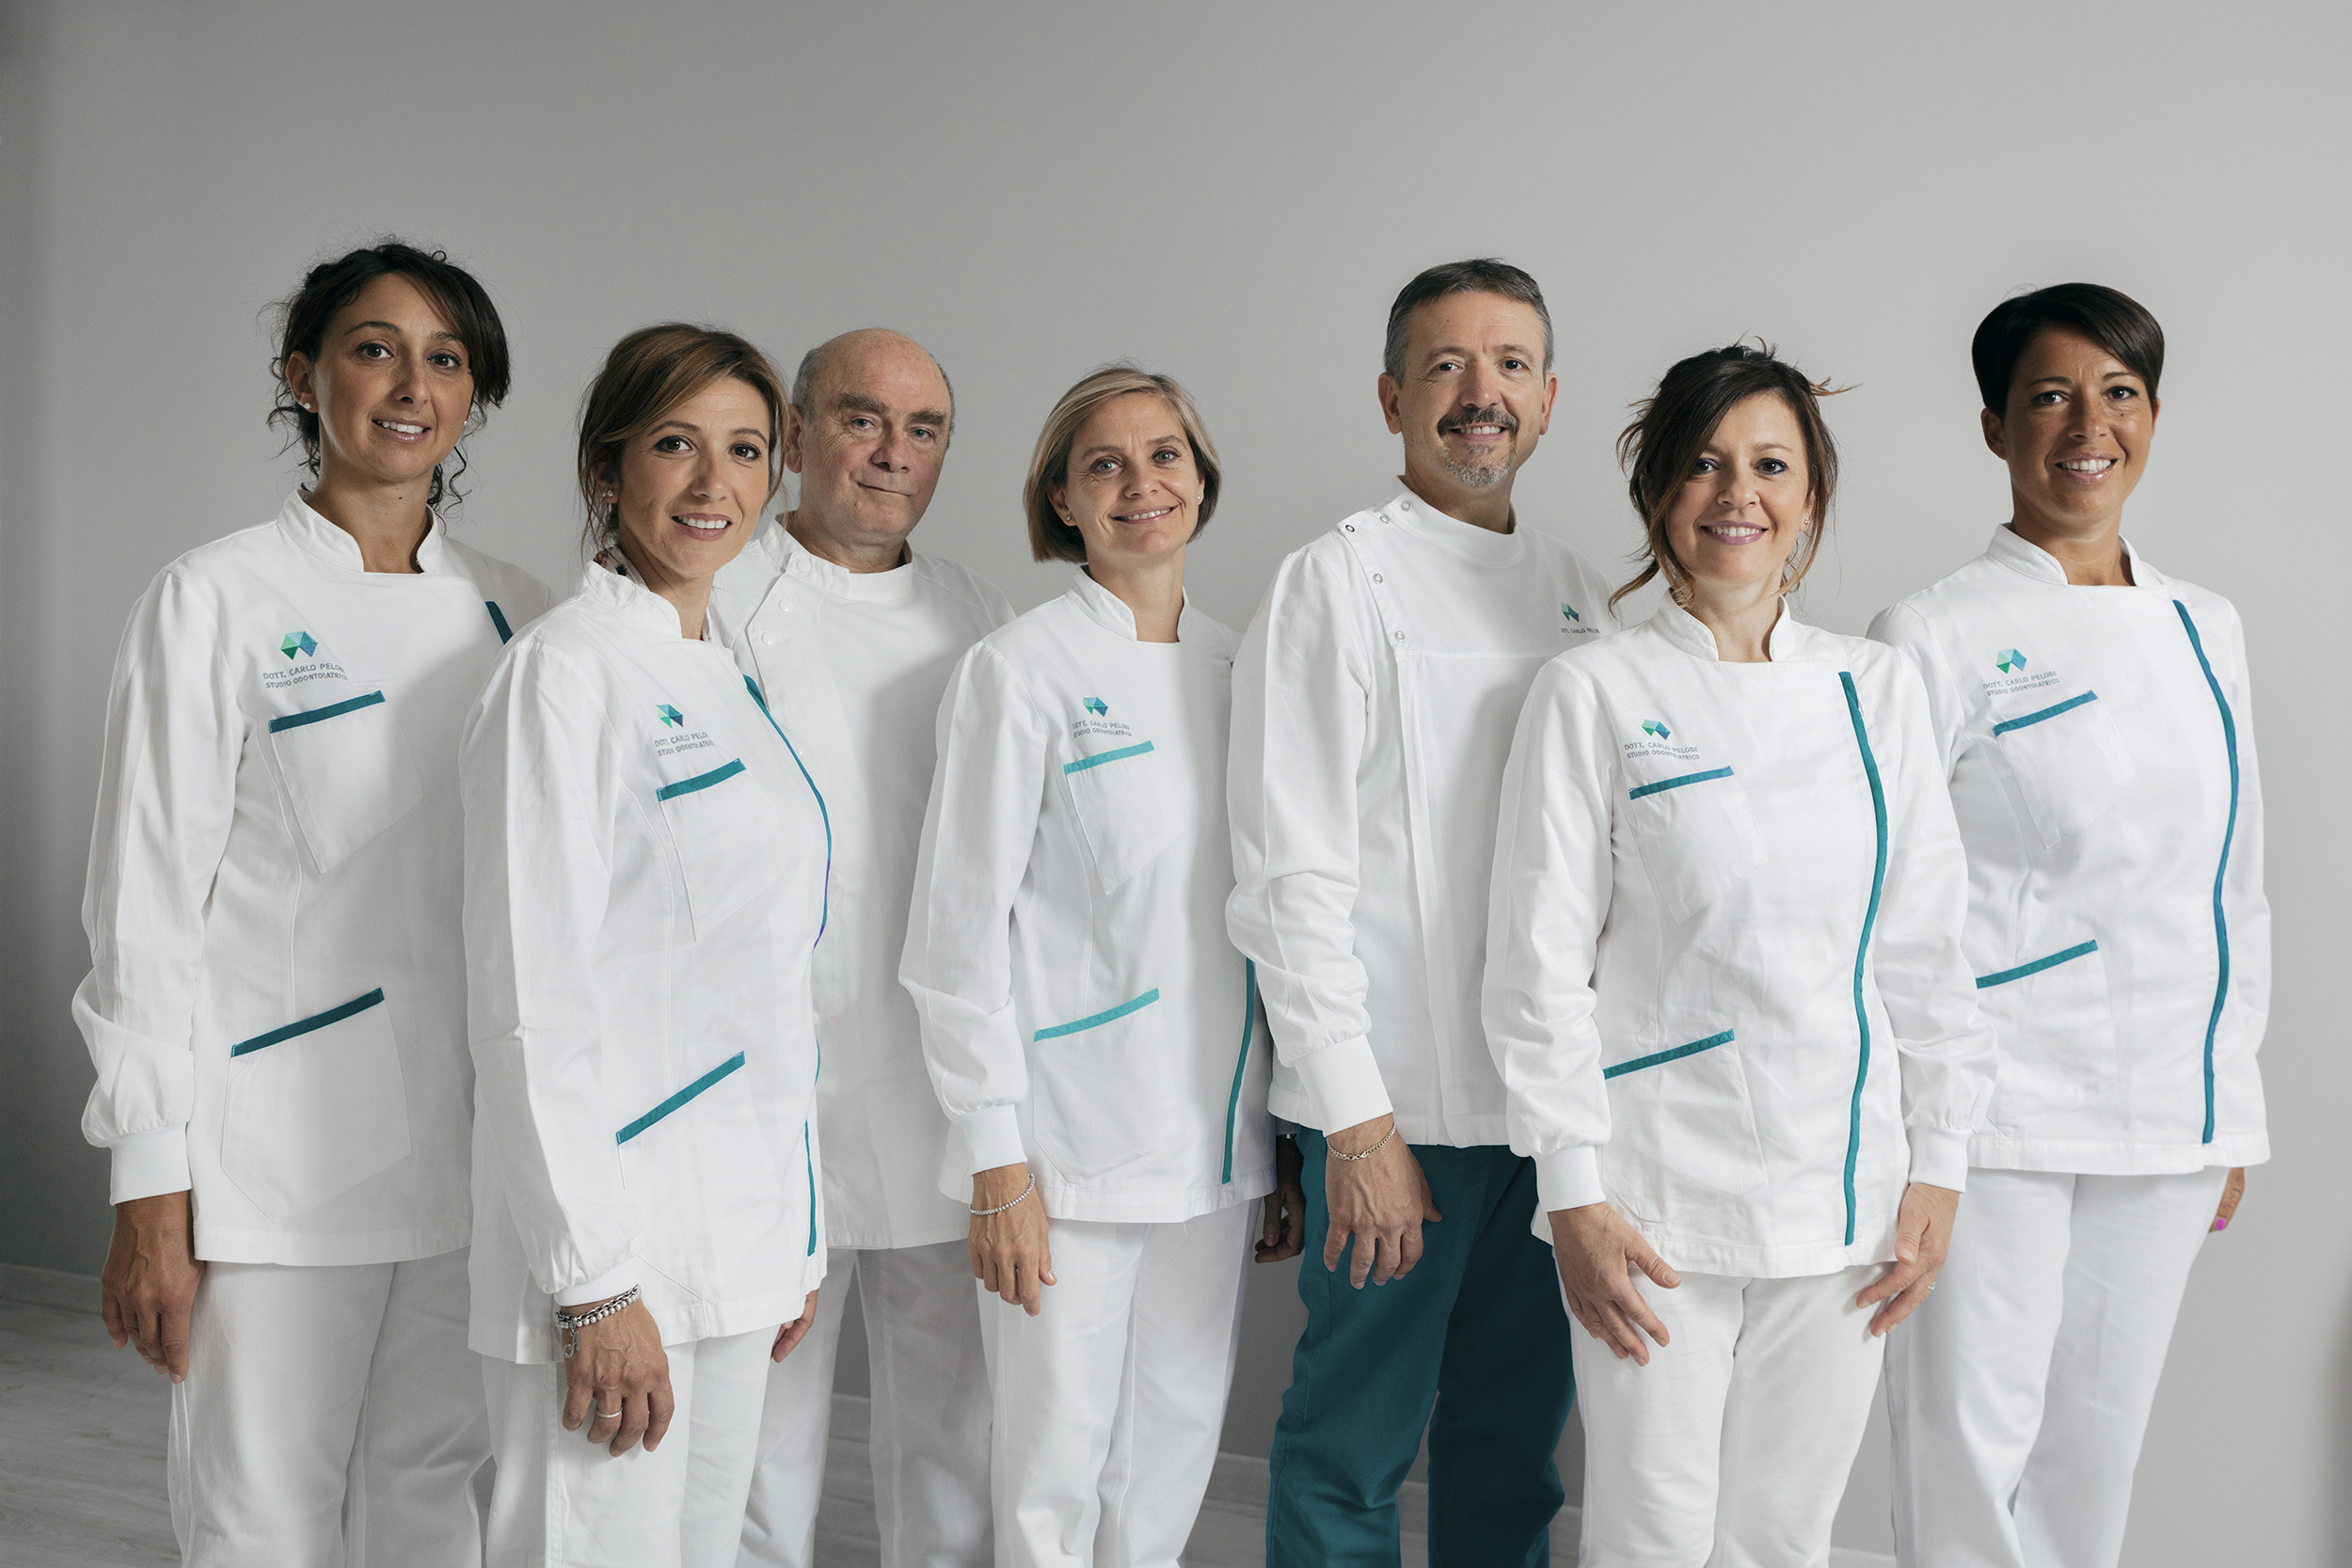 giorgio-leone-institutional-corporate-industrial-Carlo-Pelosi-portrait-staff.jpg